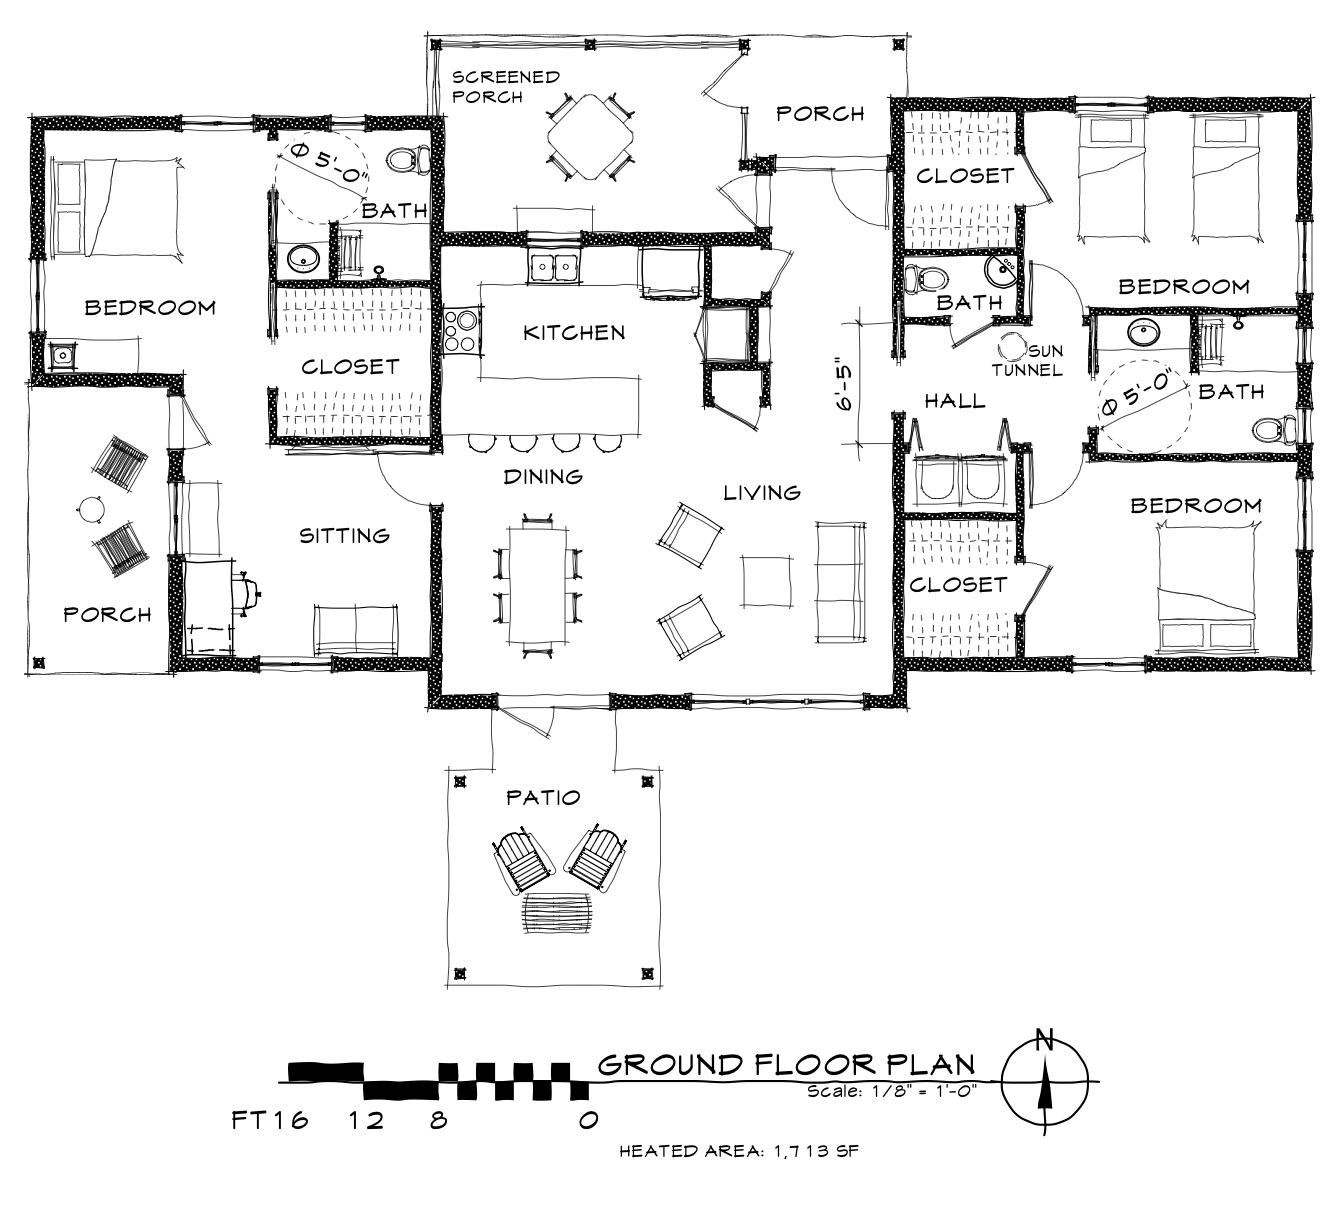 1 Story - Floor Plan